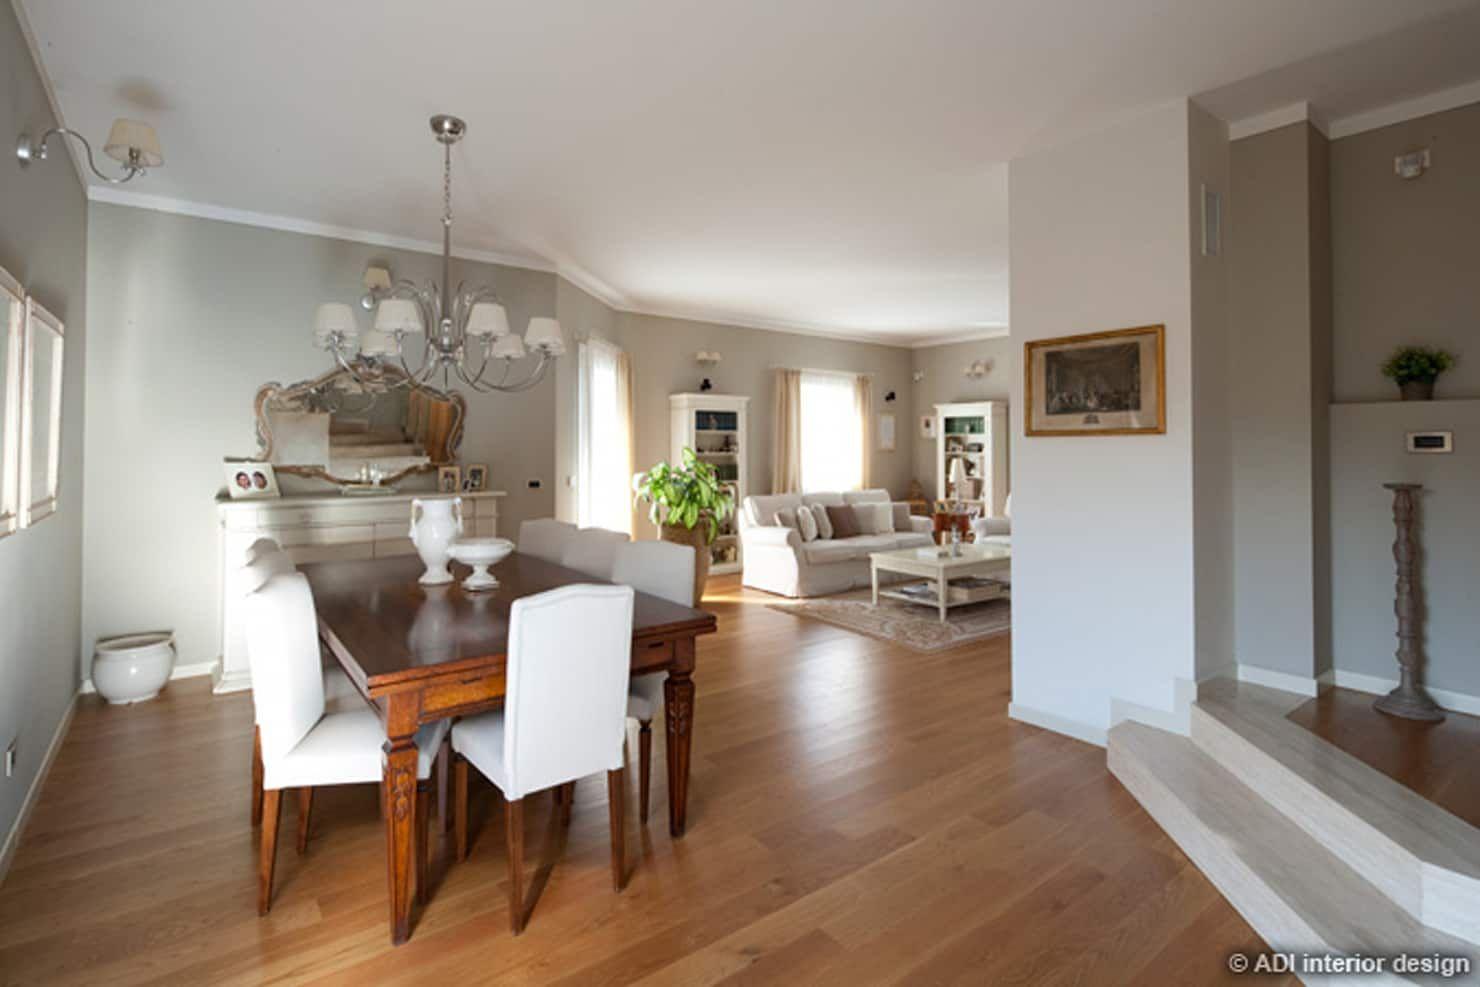 Casa raffinata sala da pranzo in stile classico di adi ...